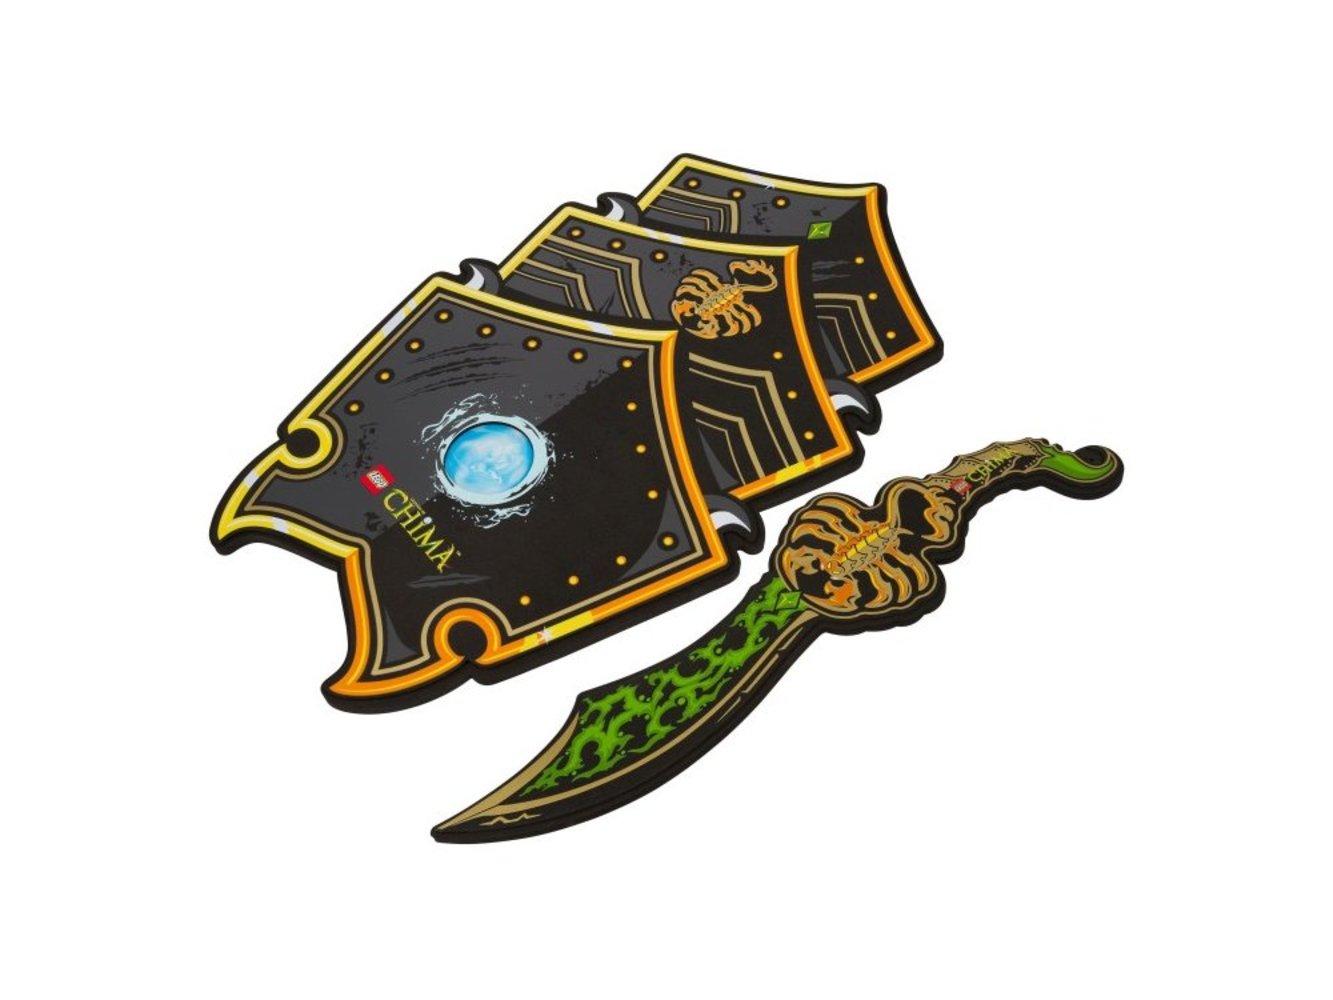 Legends of Chima Scorpion Sword & Shield